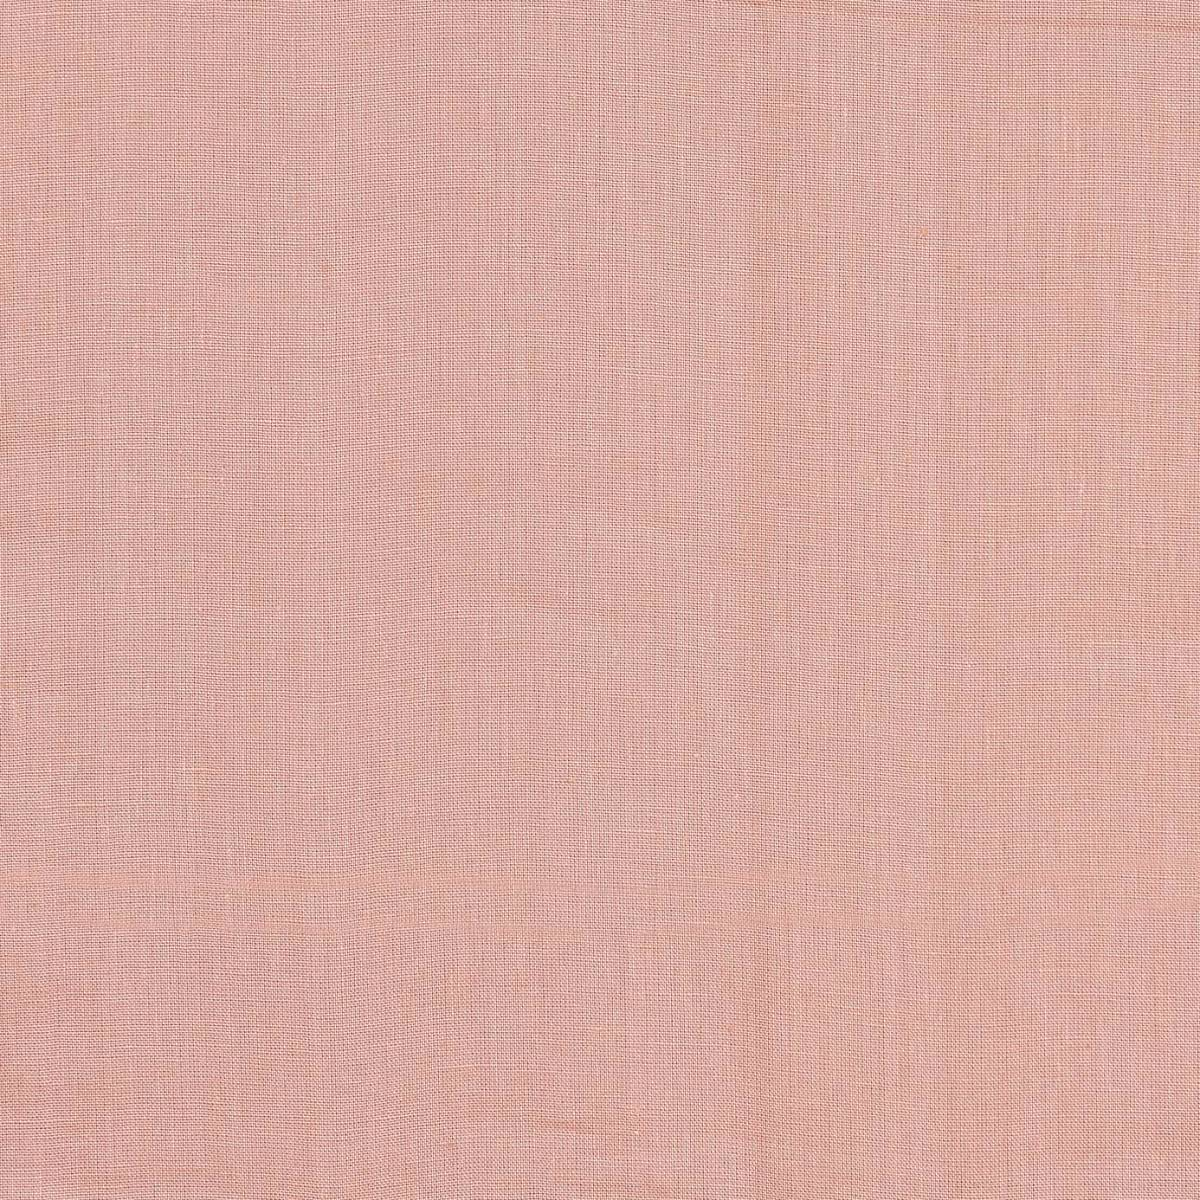 Ambience Fabric Shrimp 7158 215 Prestigious Textiles